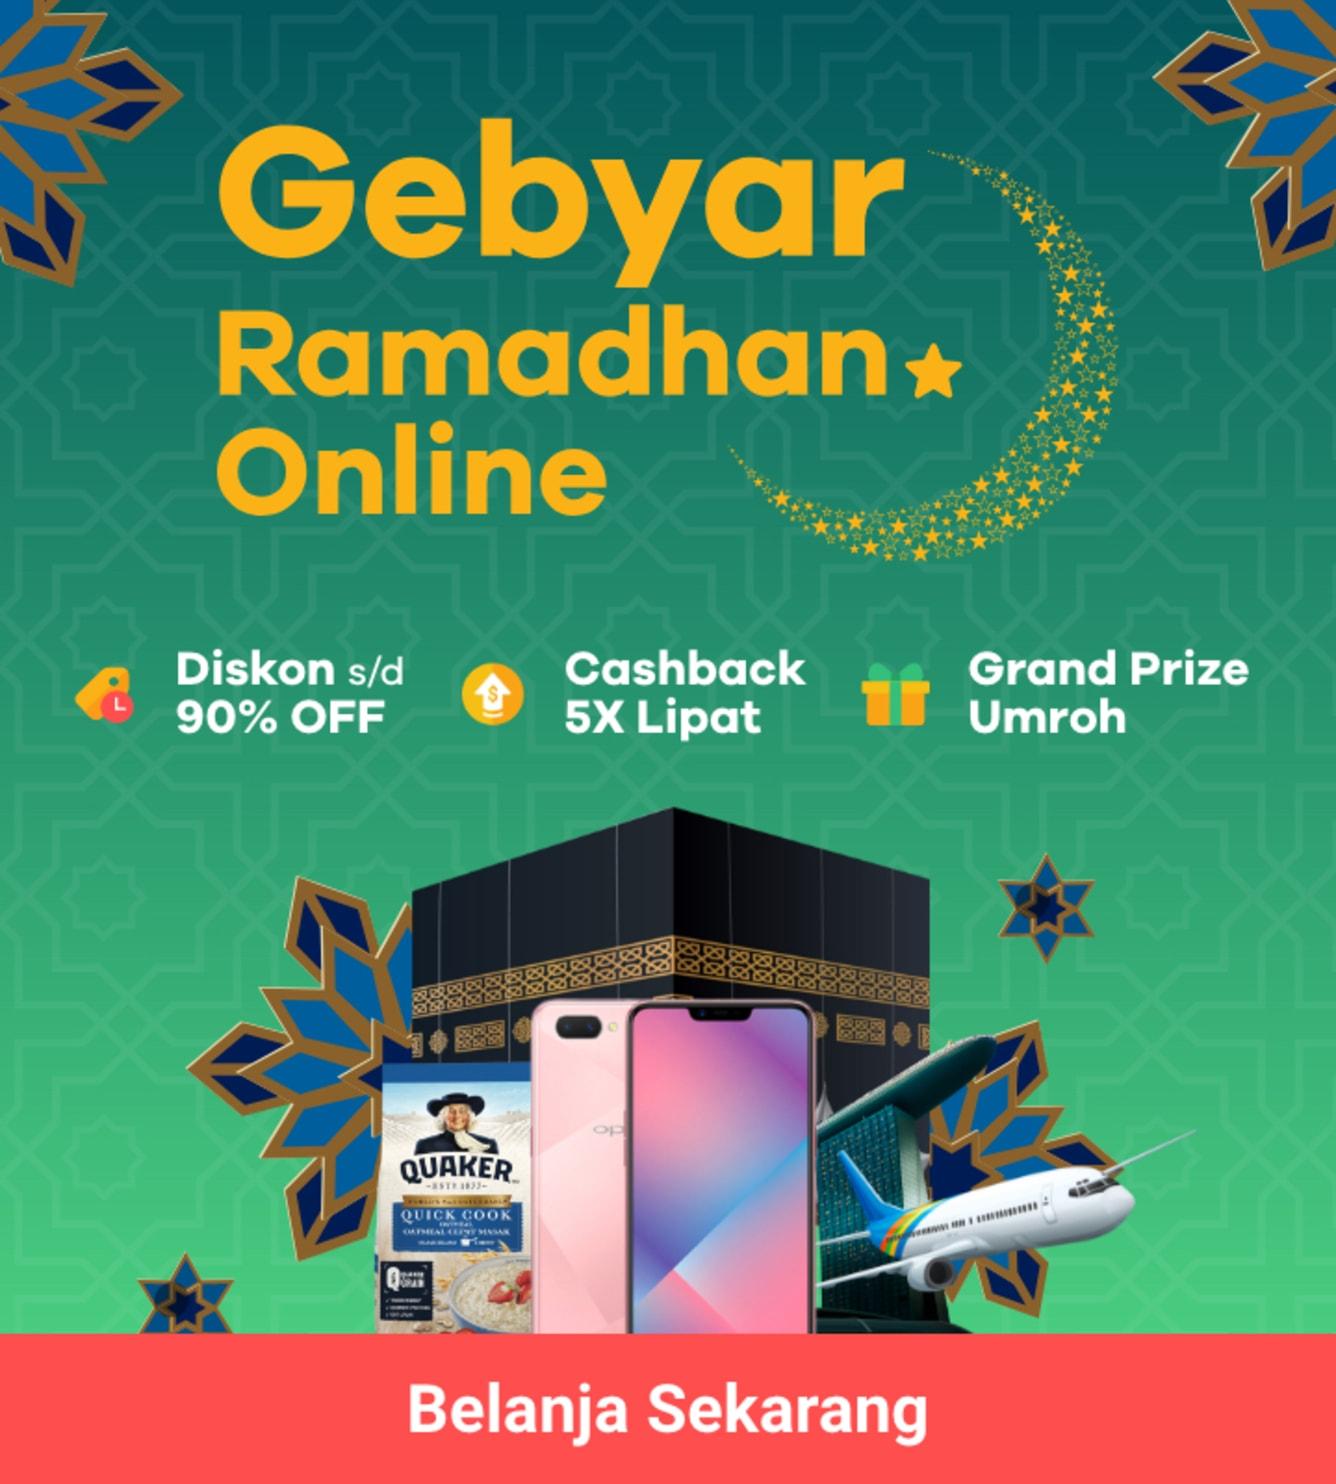 Week 20 - Promo Ramadhan 2019